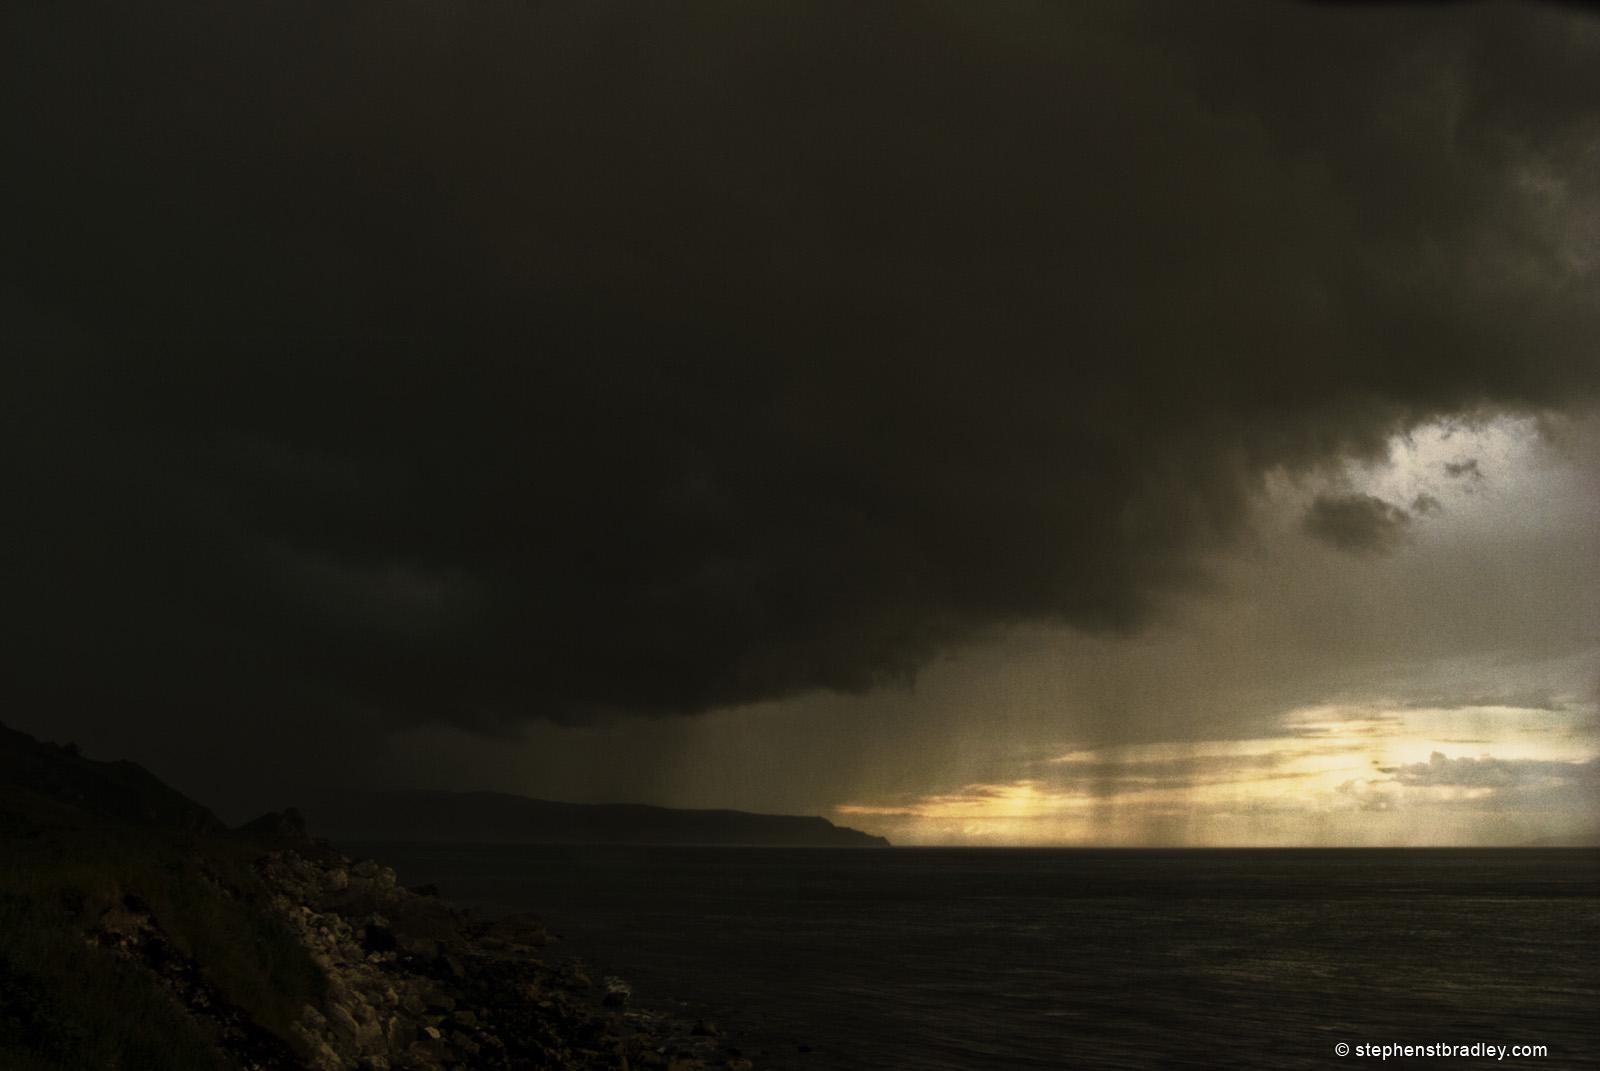 Rain clouds rolling onto Irish Sea from Glenariff, Northern Ireland - photo 2507.